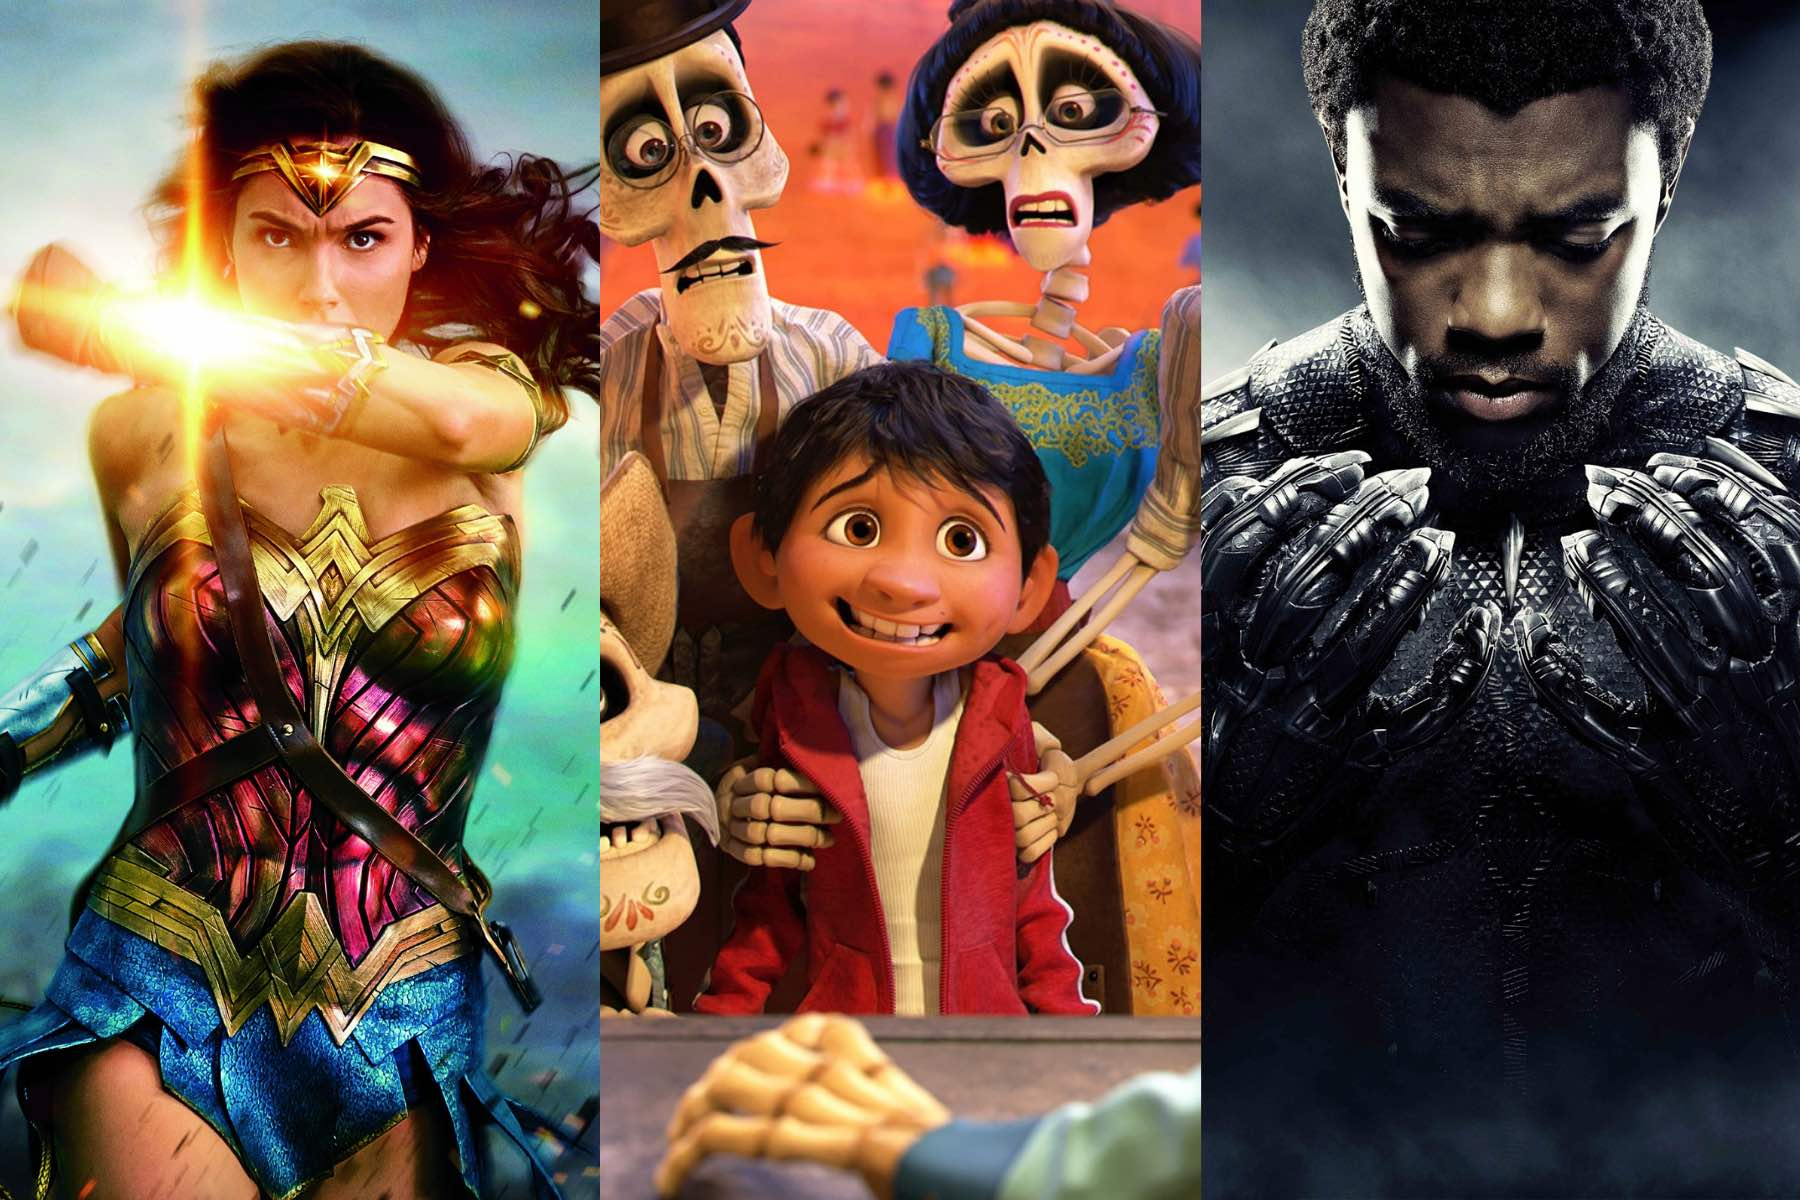 greatergood.berkeley.edu: Diverse Films Make More Money at the Box Office